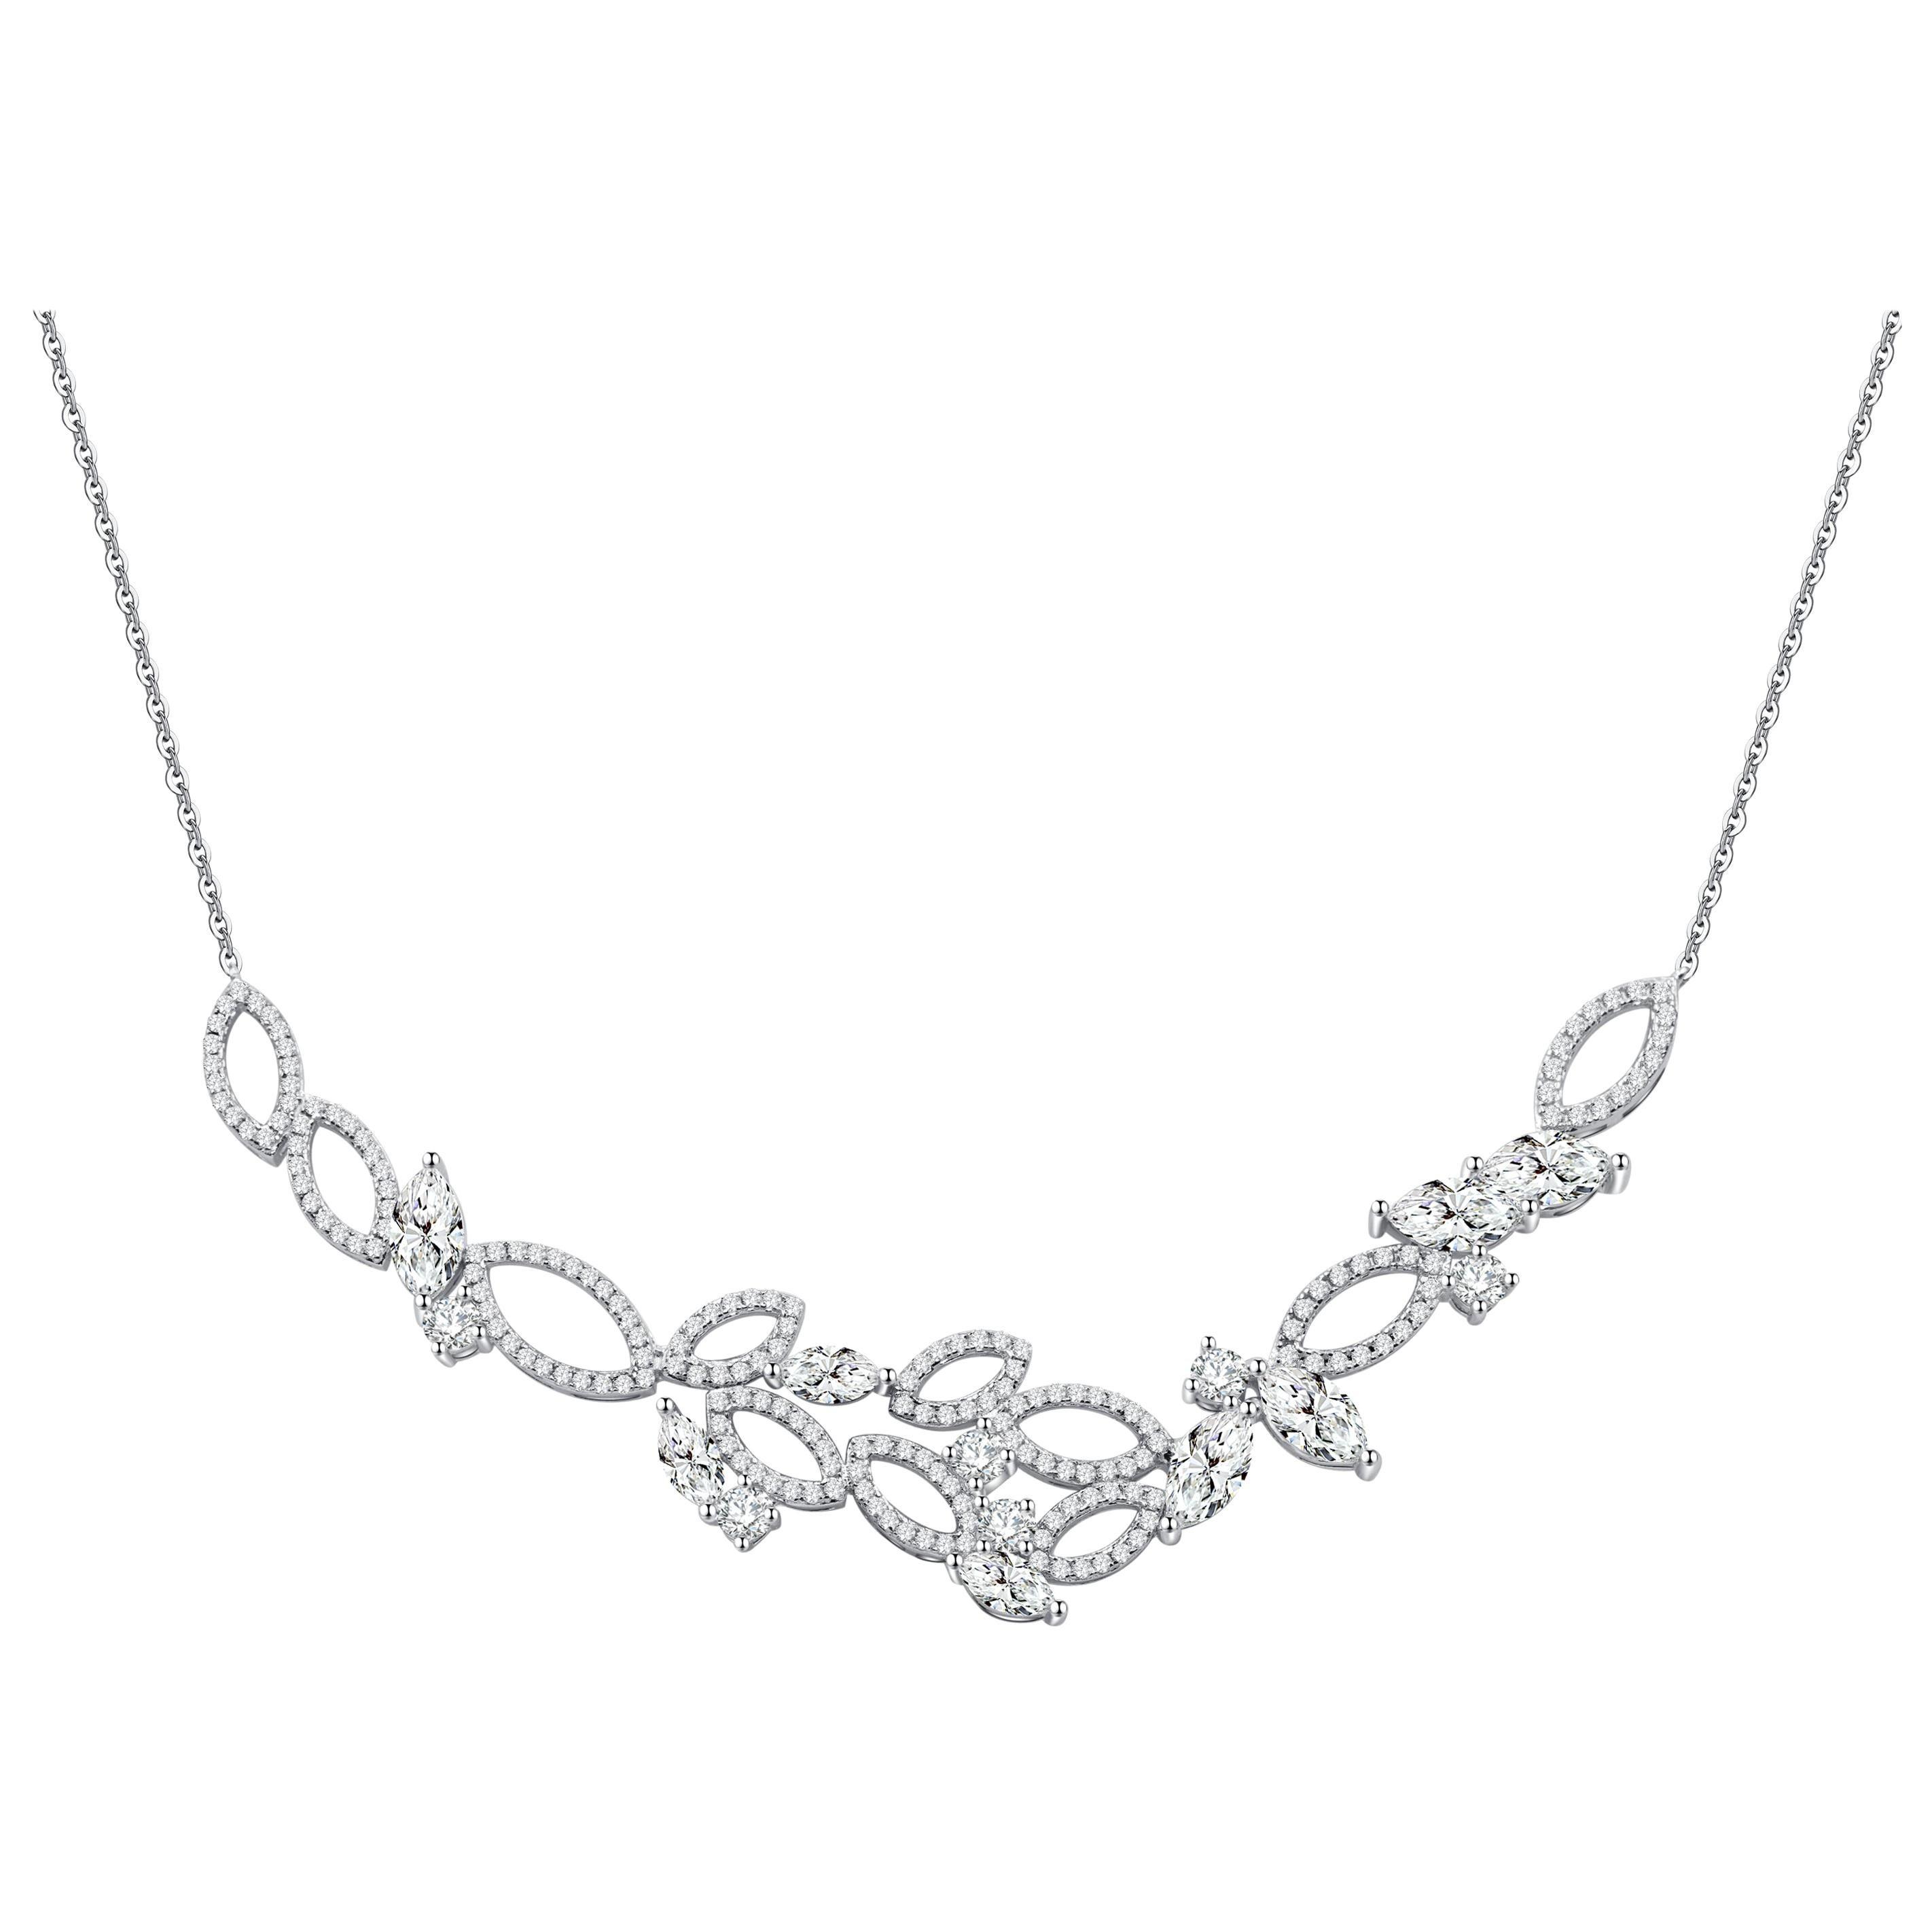 18 Karat White Gold Diamond Garden Necklace